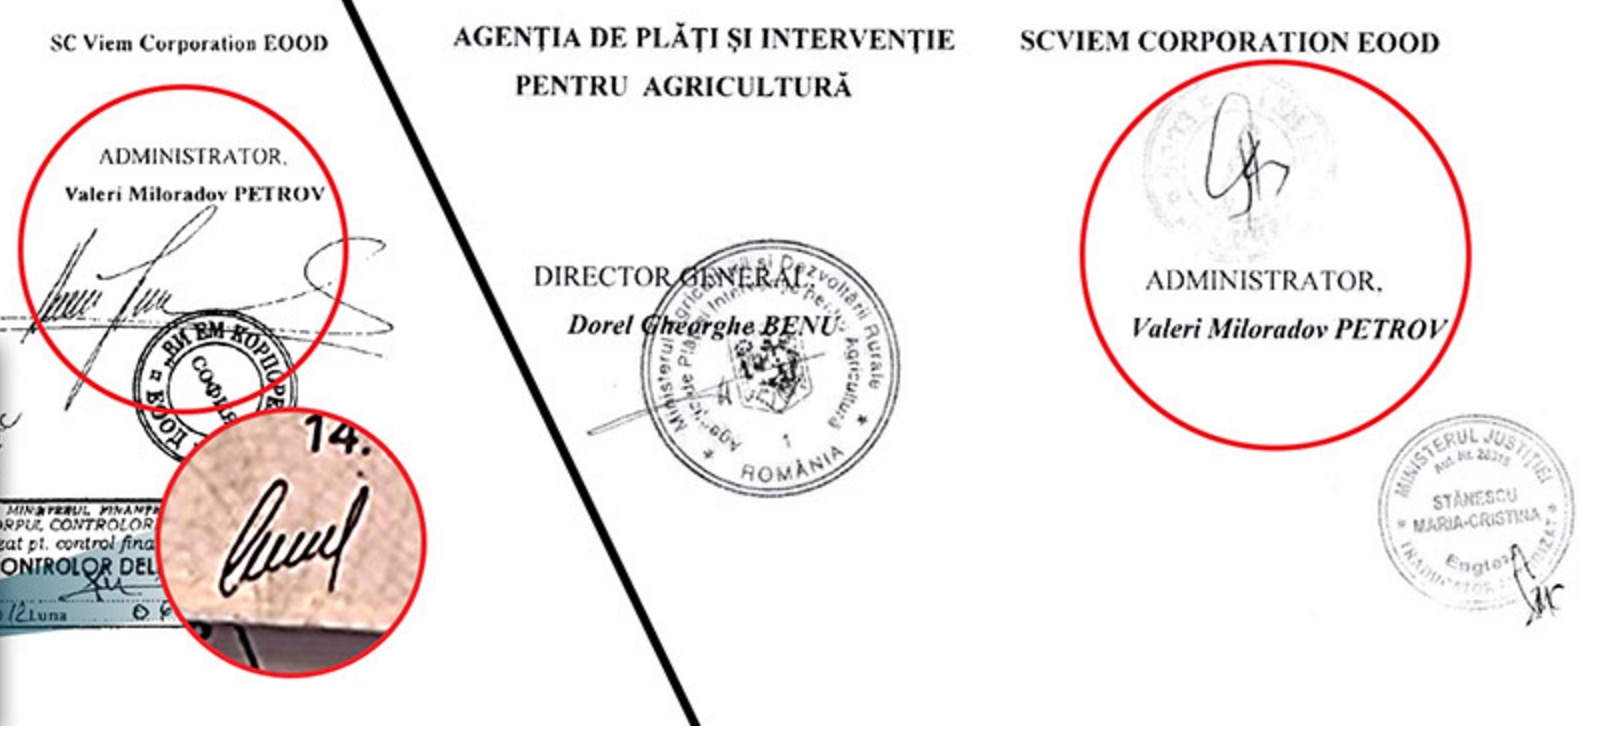 Подписите под договорите с APIA не са на собственика на фирмата